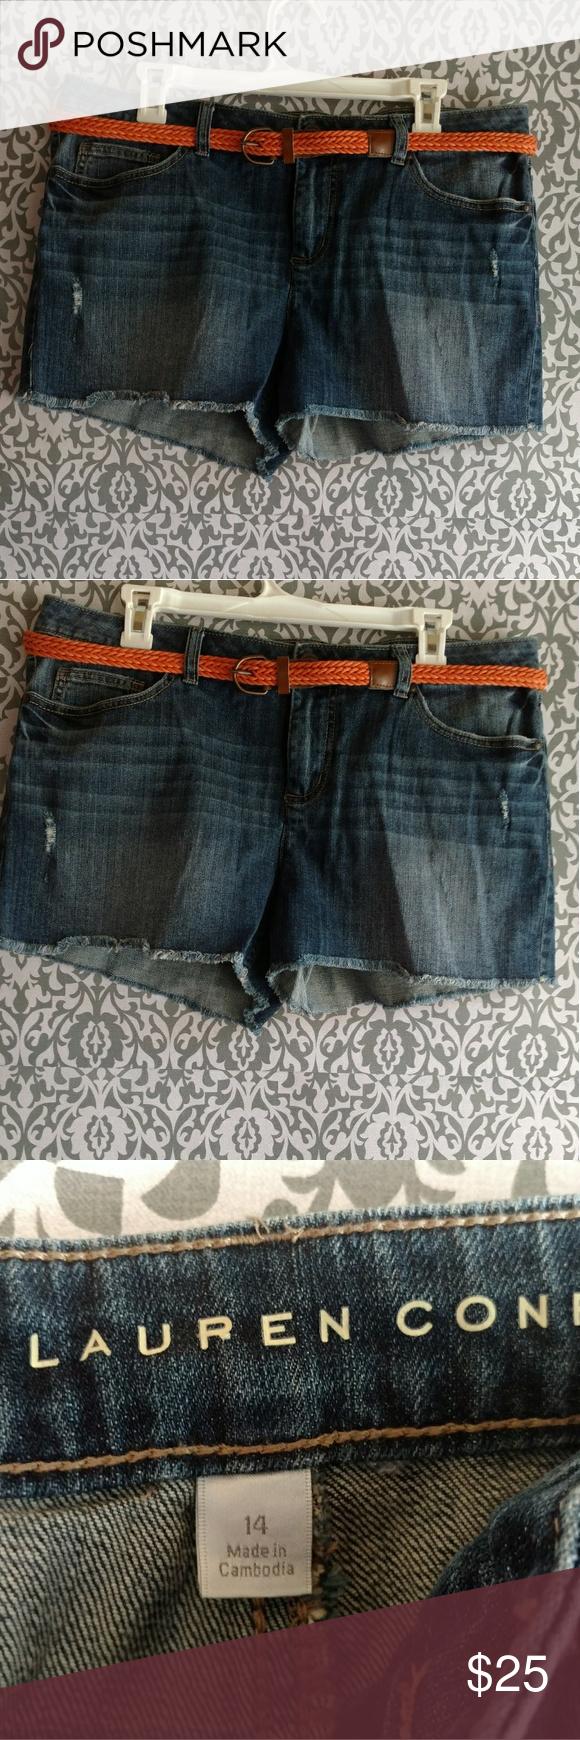 LC Lauren Conrad Shorts   Clothes design, Fashion, Lc